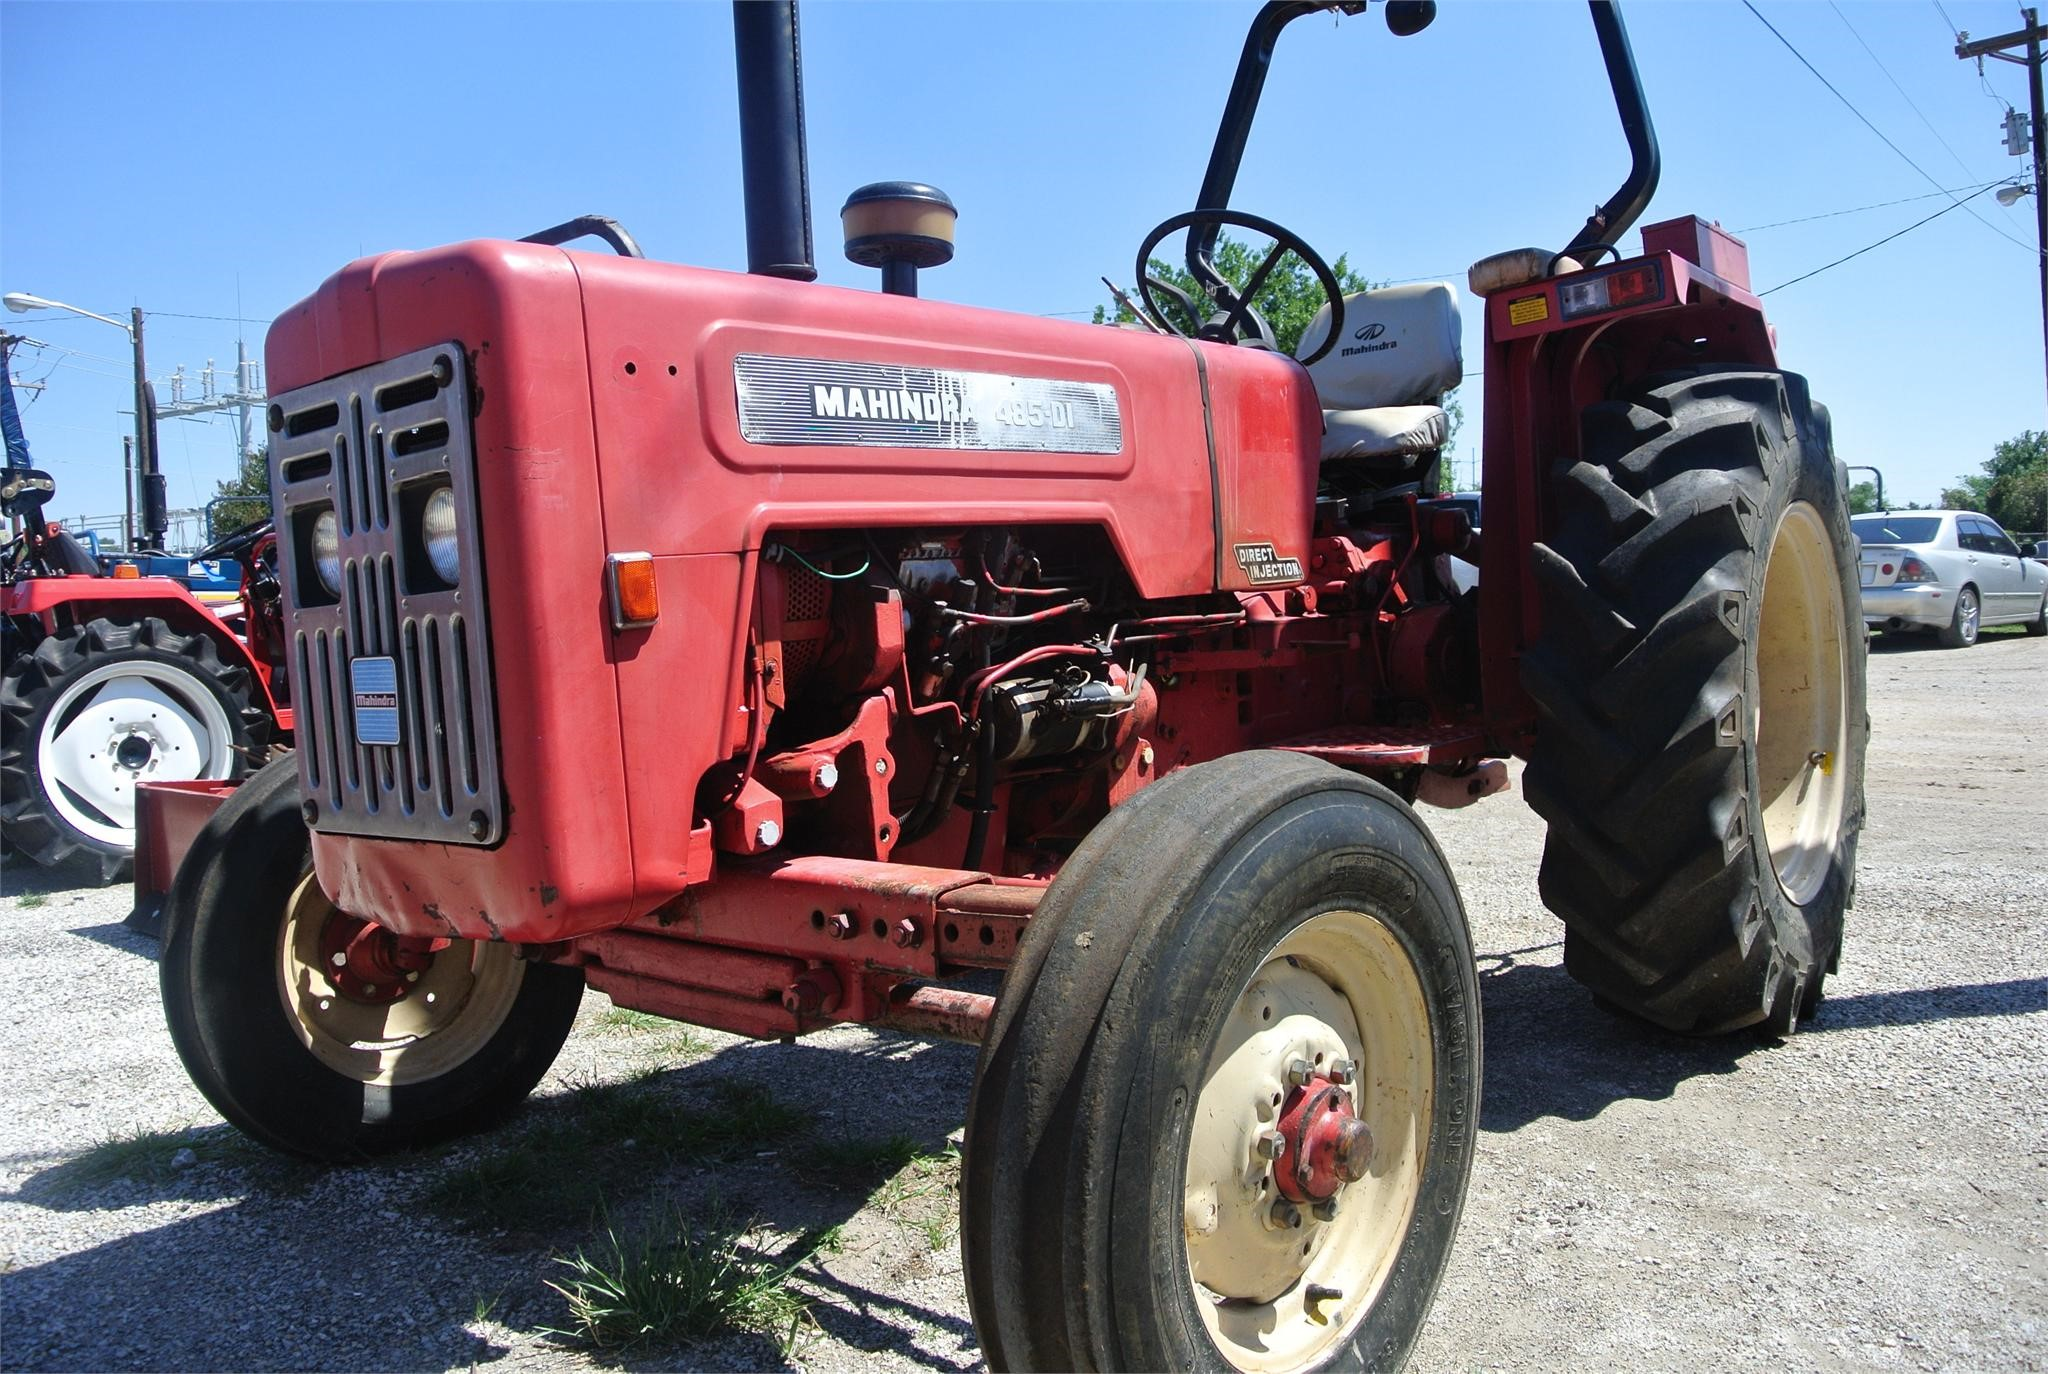 1997 MAHINDRA 485-DI 40-99 HP Tractor